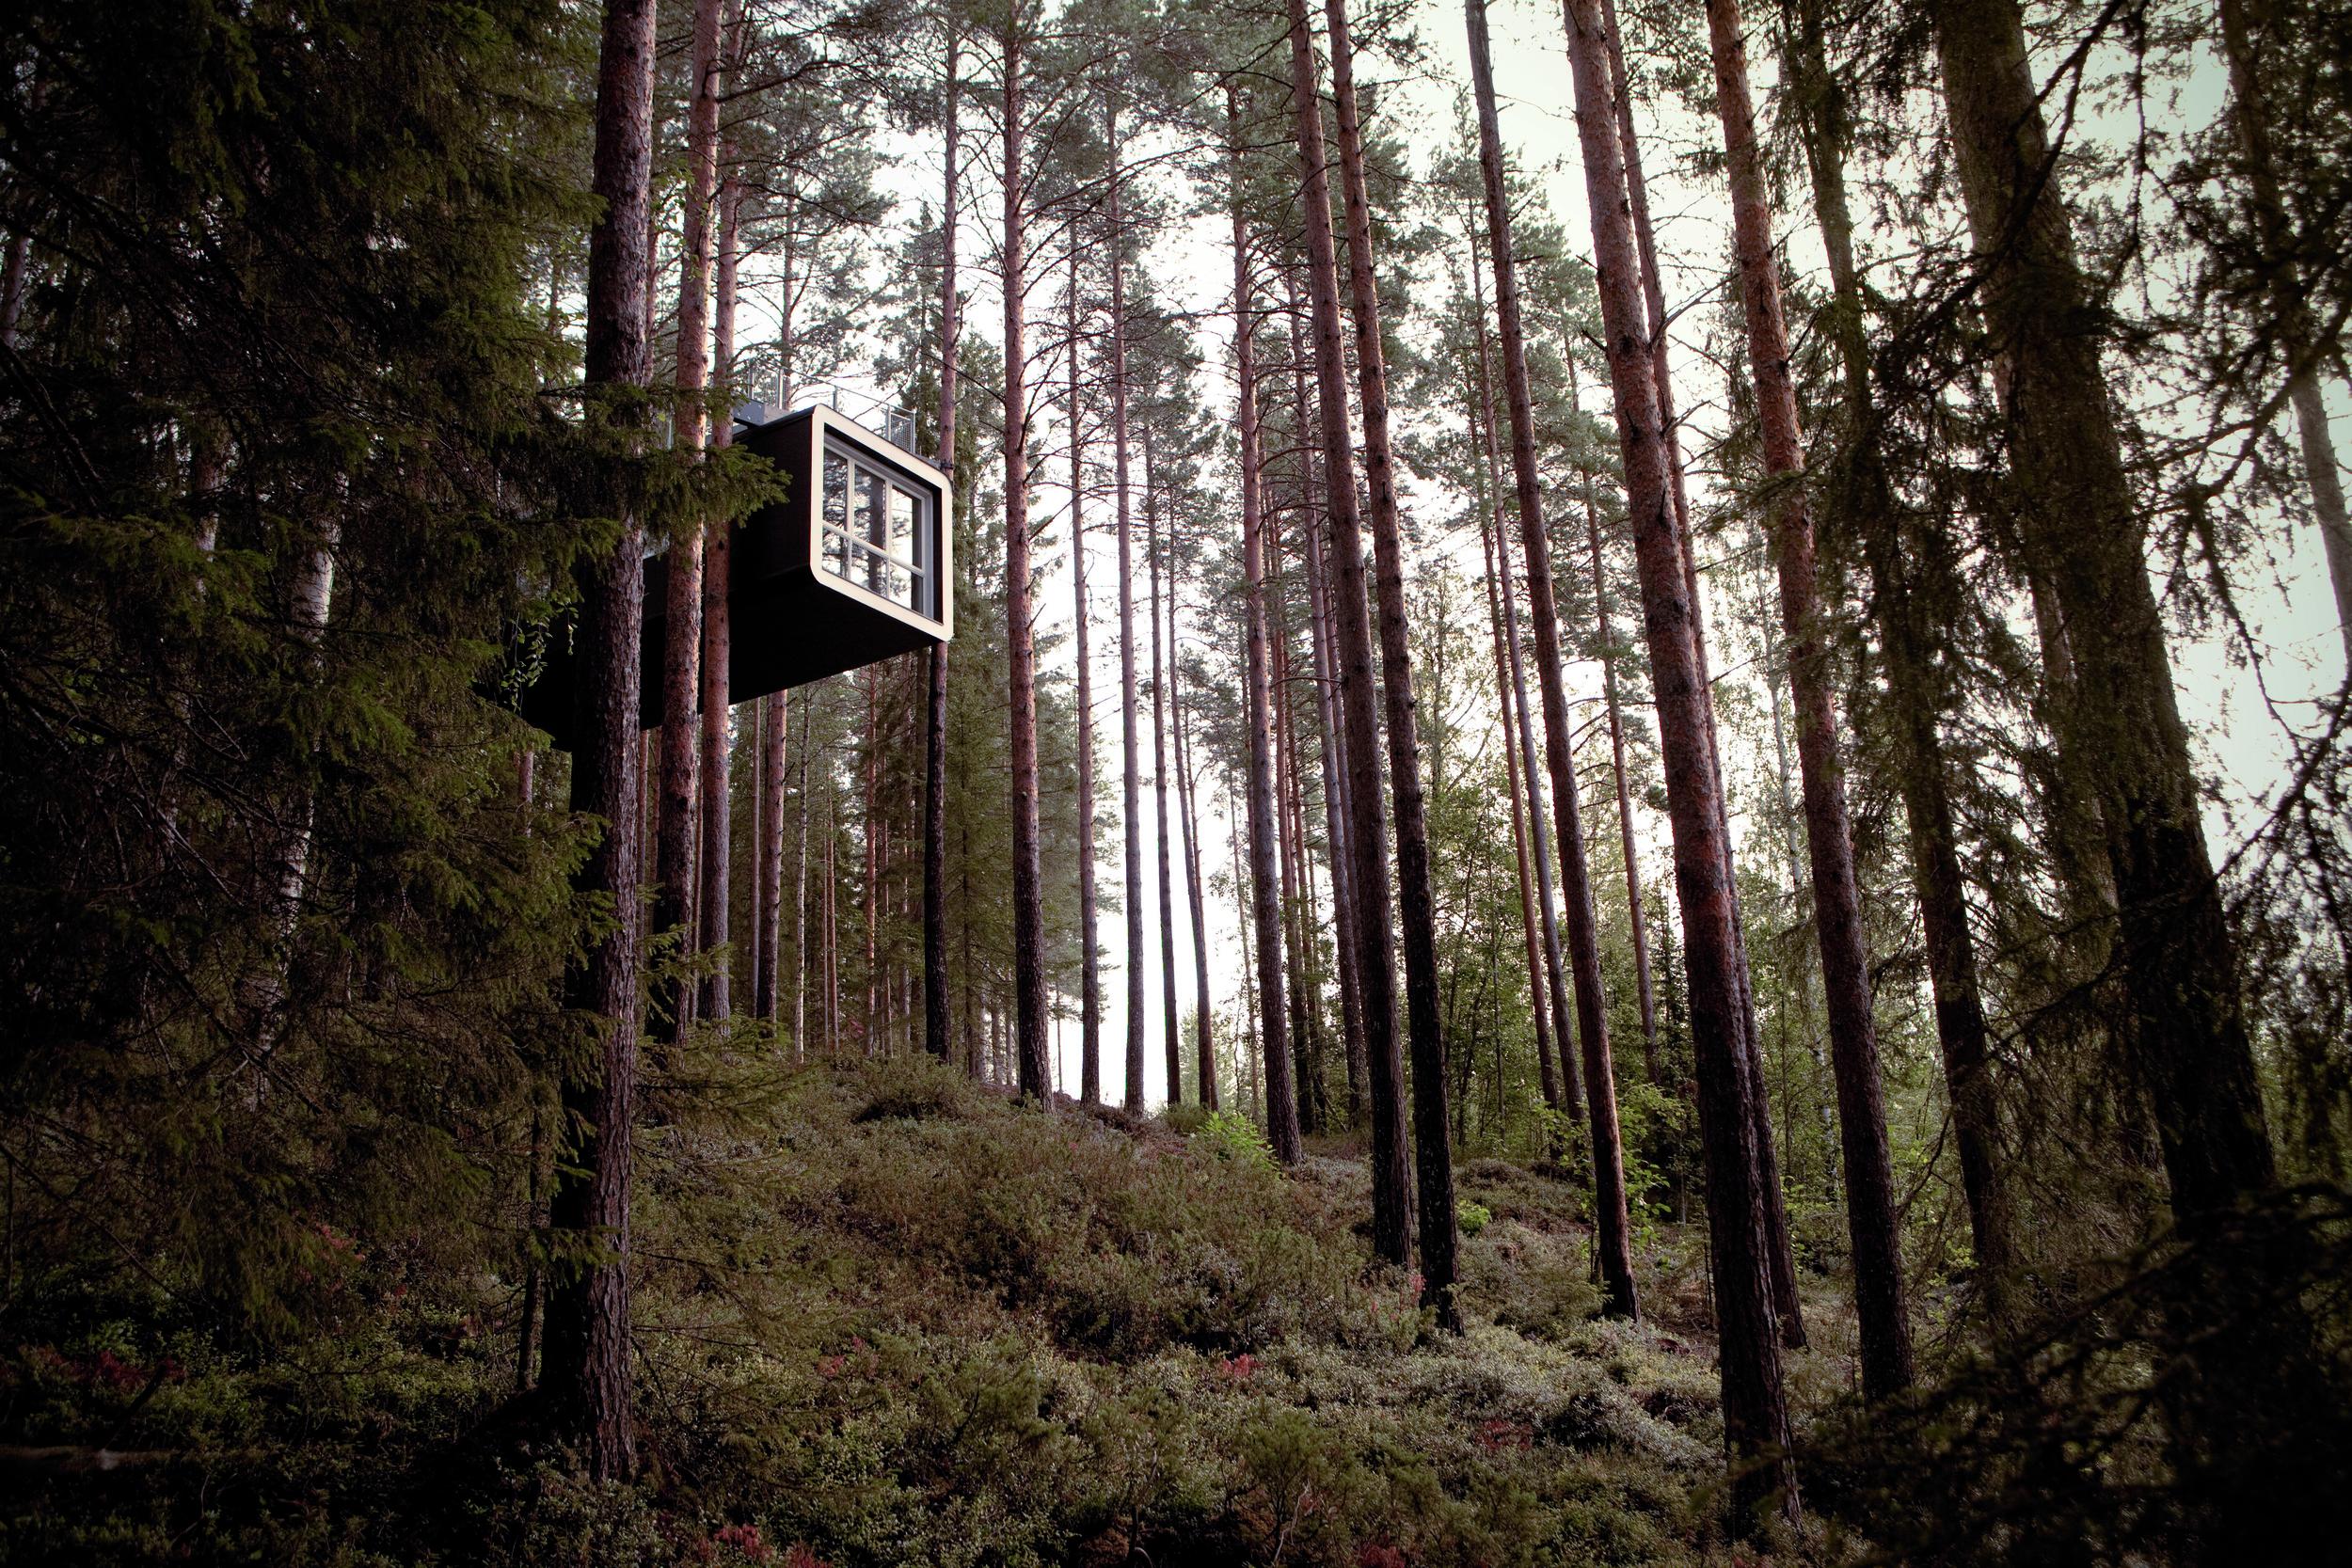 Treehotel - SWEDEN